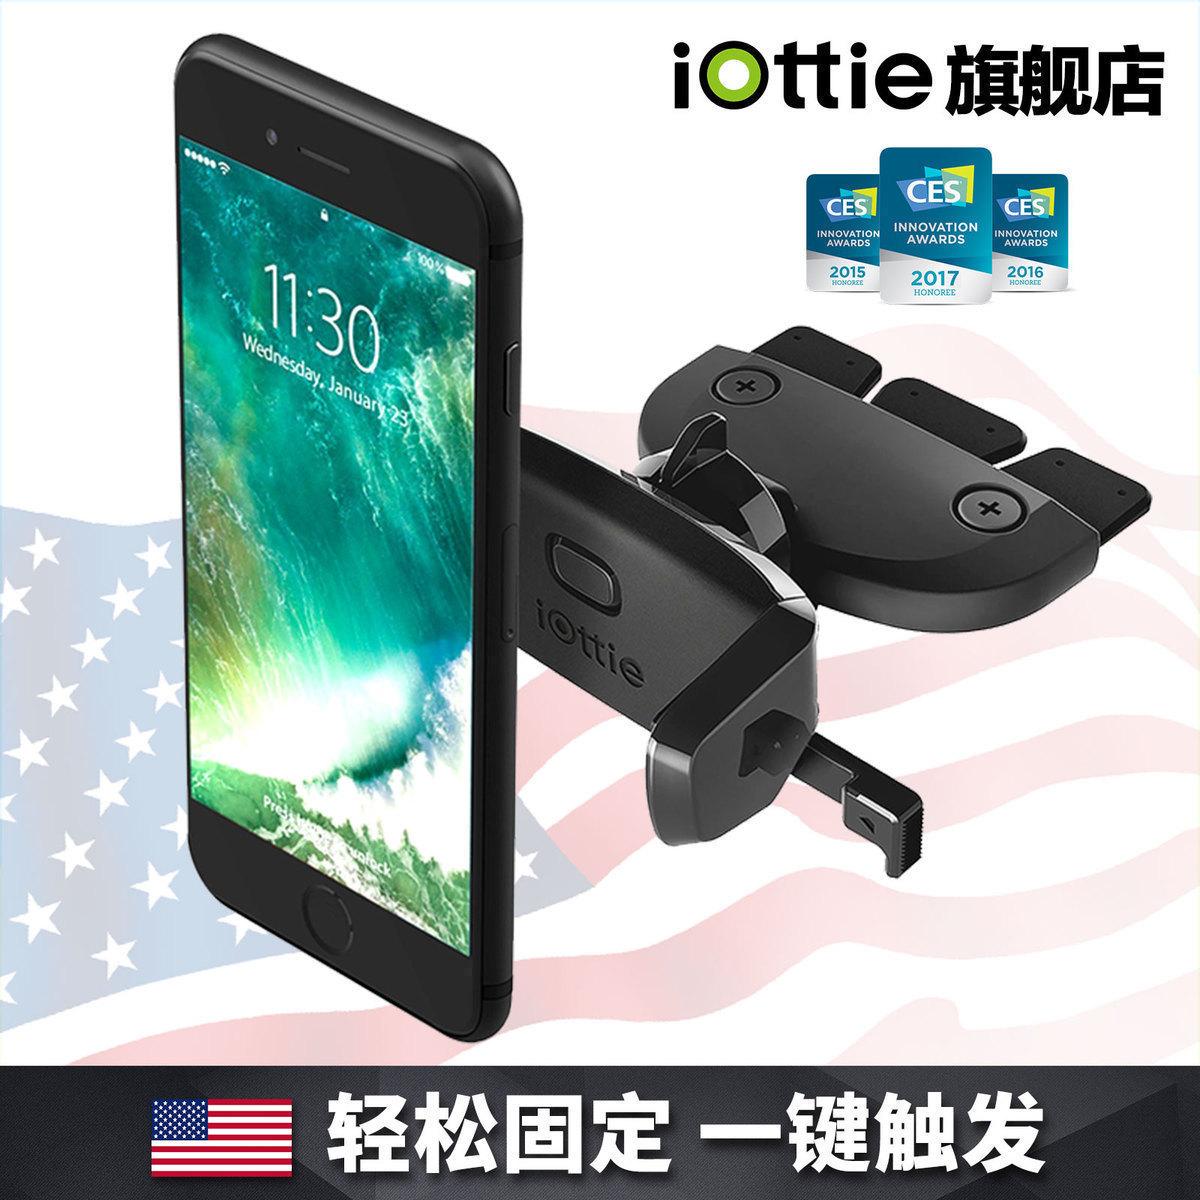 iOttie Easy One Touch Mini CD口汽车载手机GPS导航支架